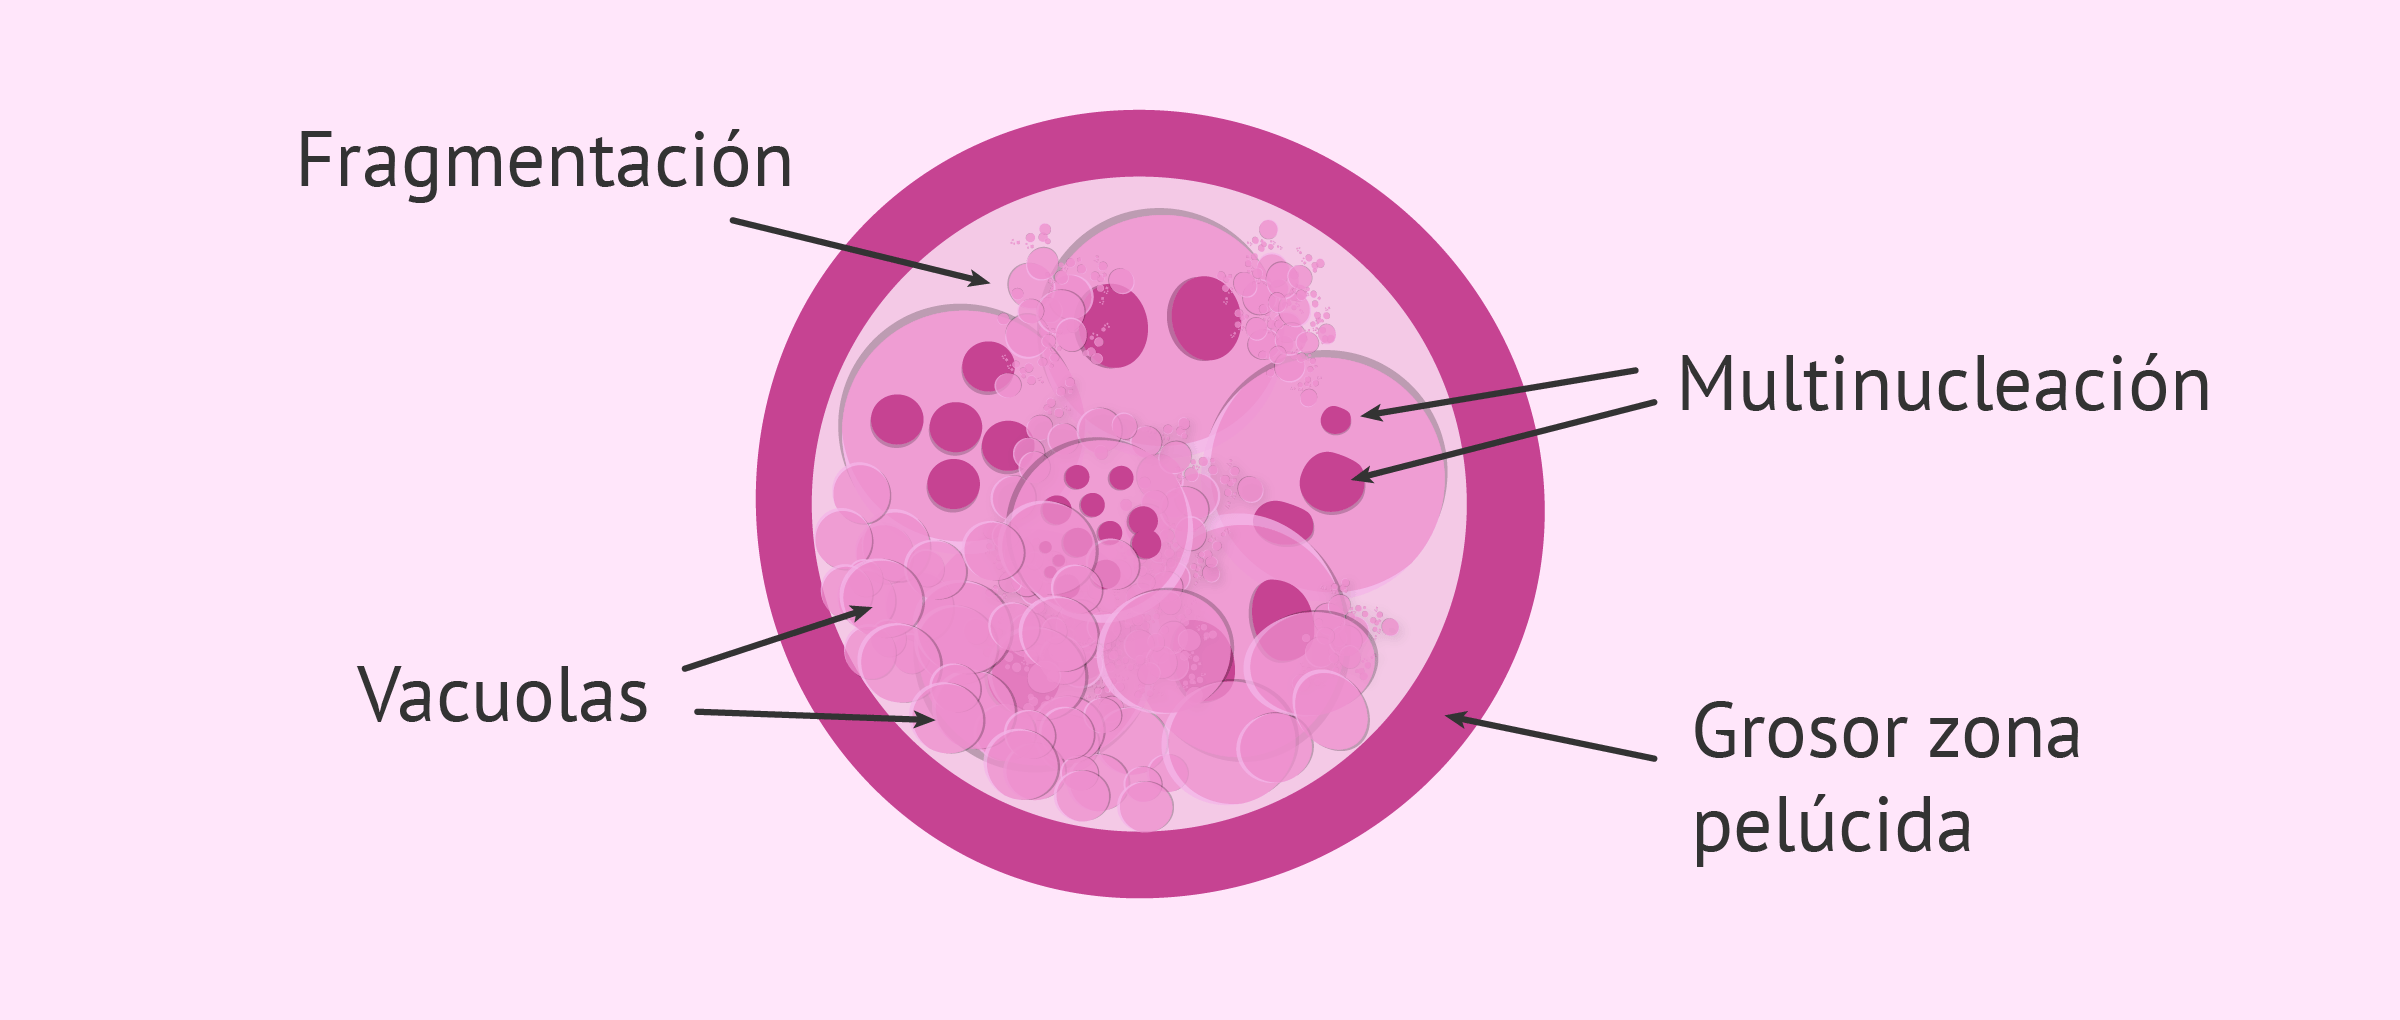 Criterios morfológicos de clasificación embrionaria